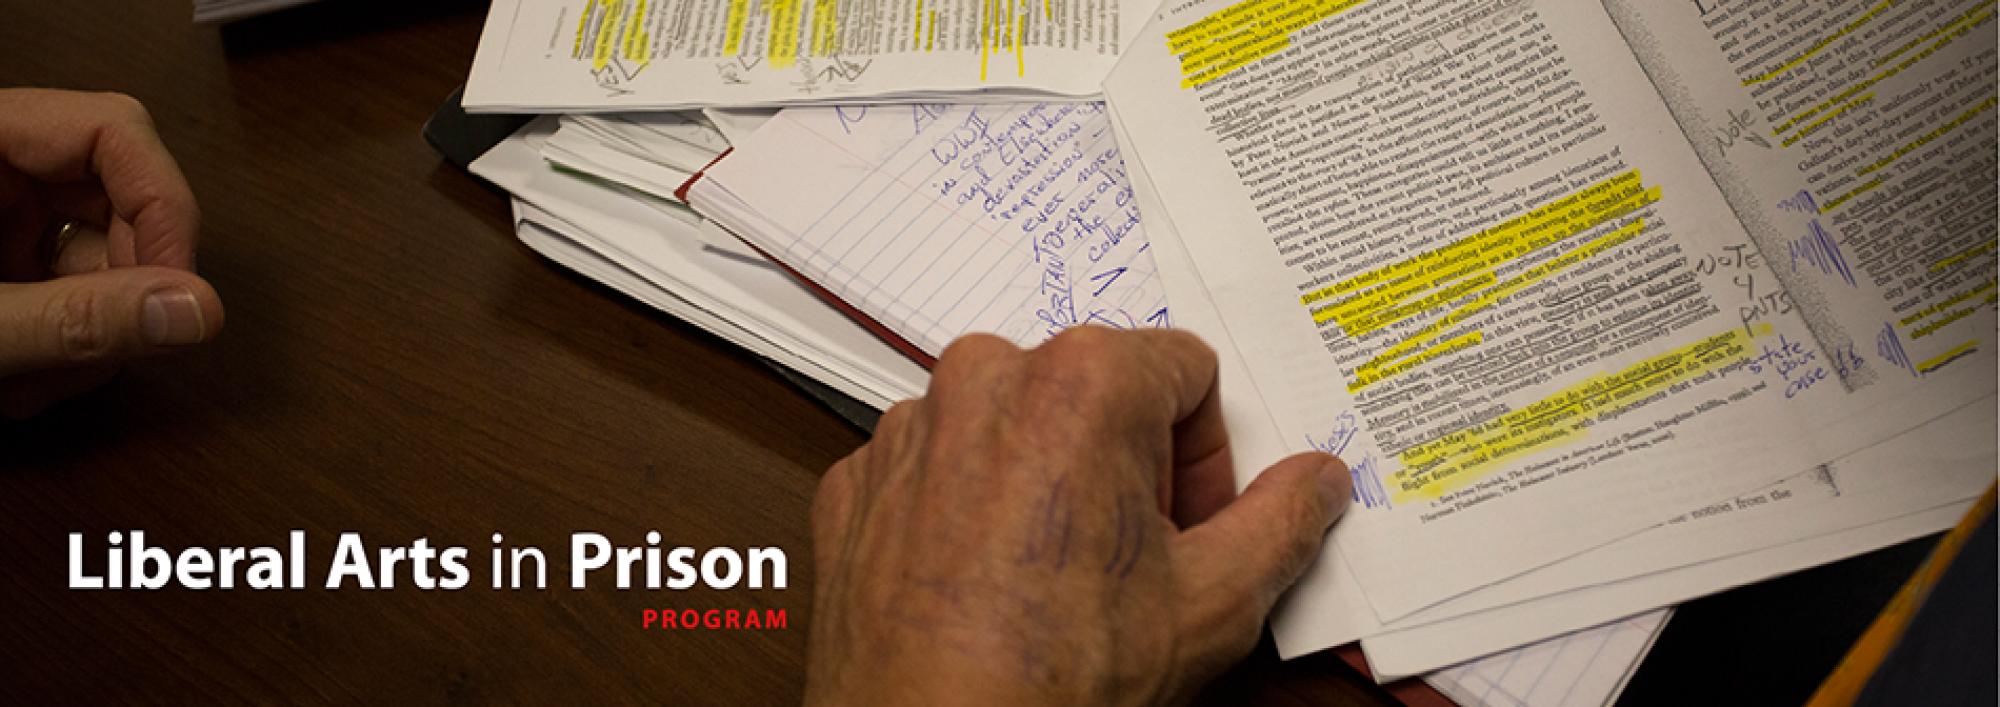 Liberal Arts in Prison Program